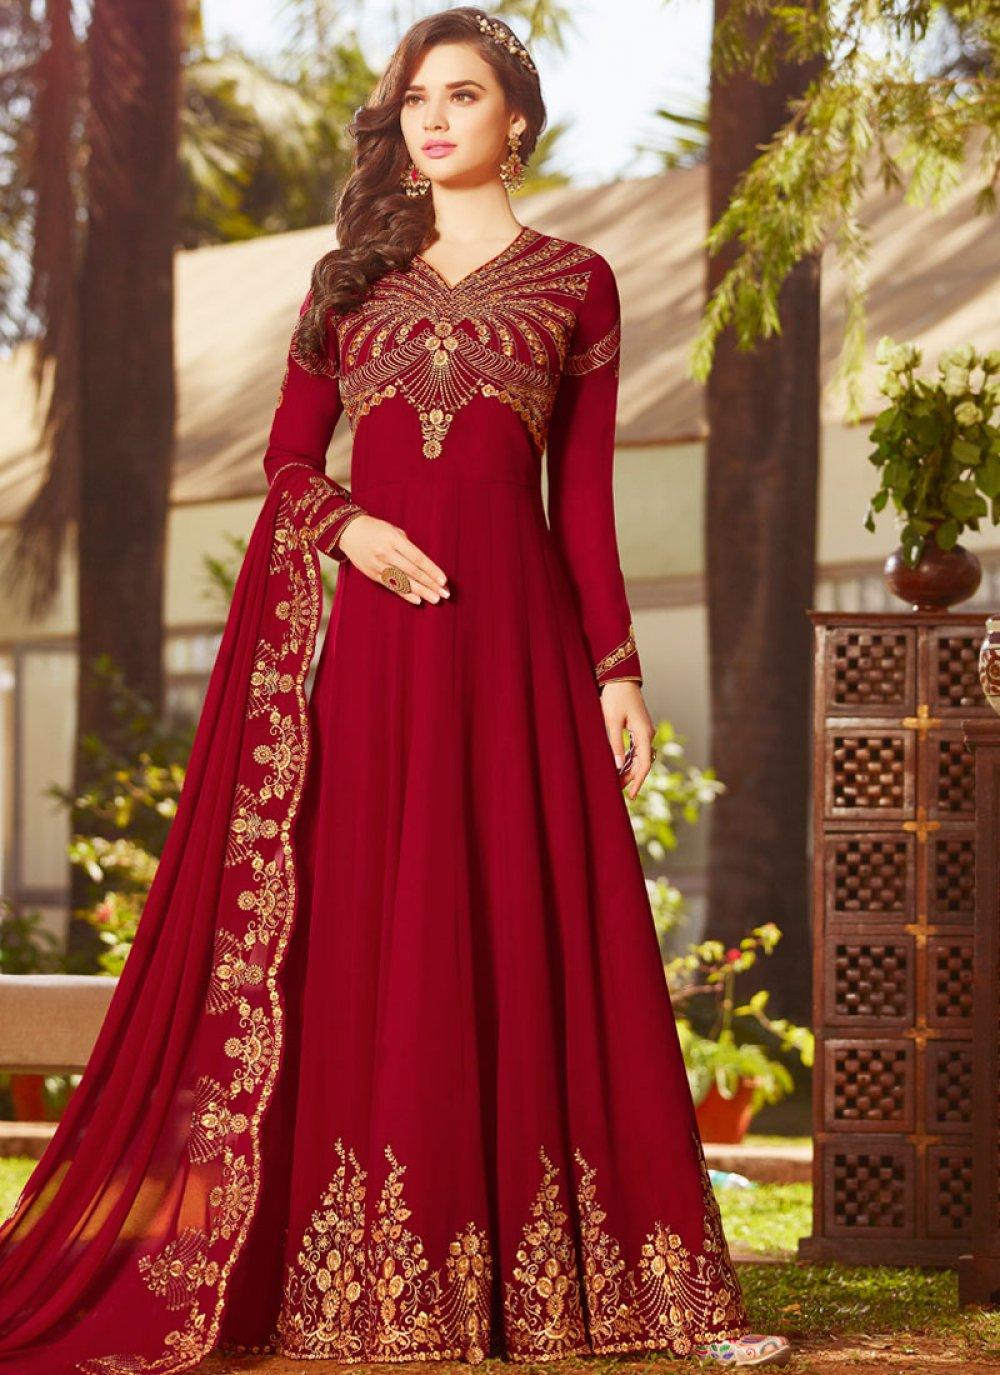 Faux Georgette Resham Red Floor Length Anarkali Suit